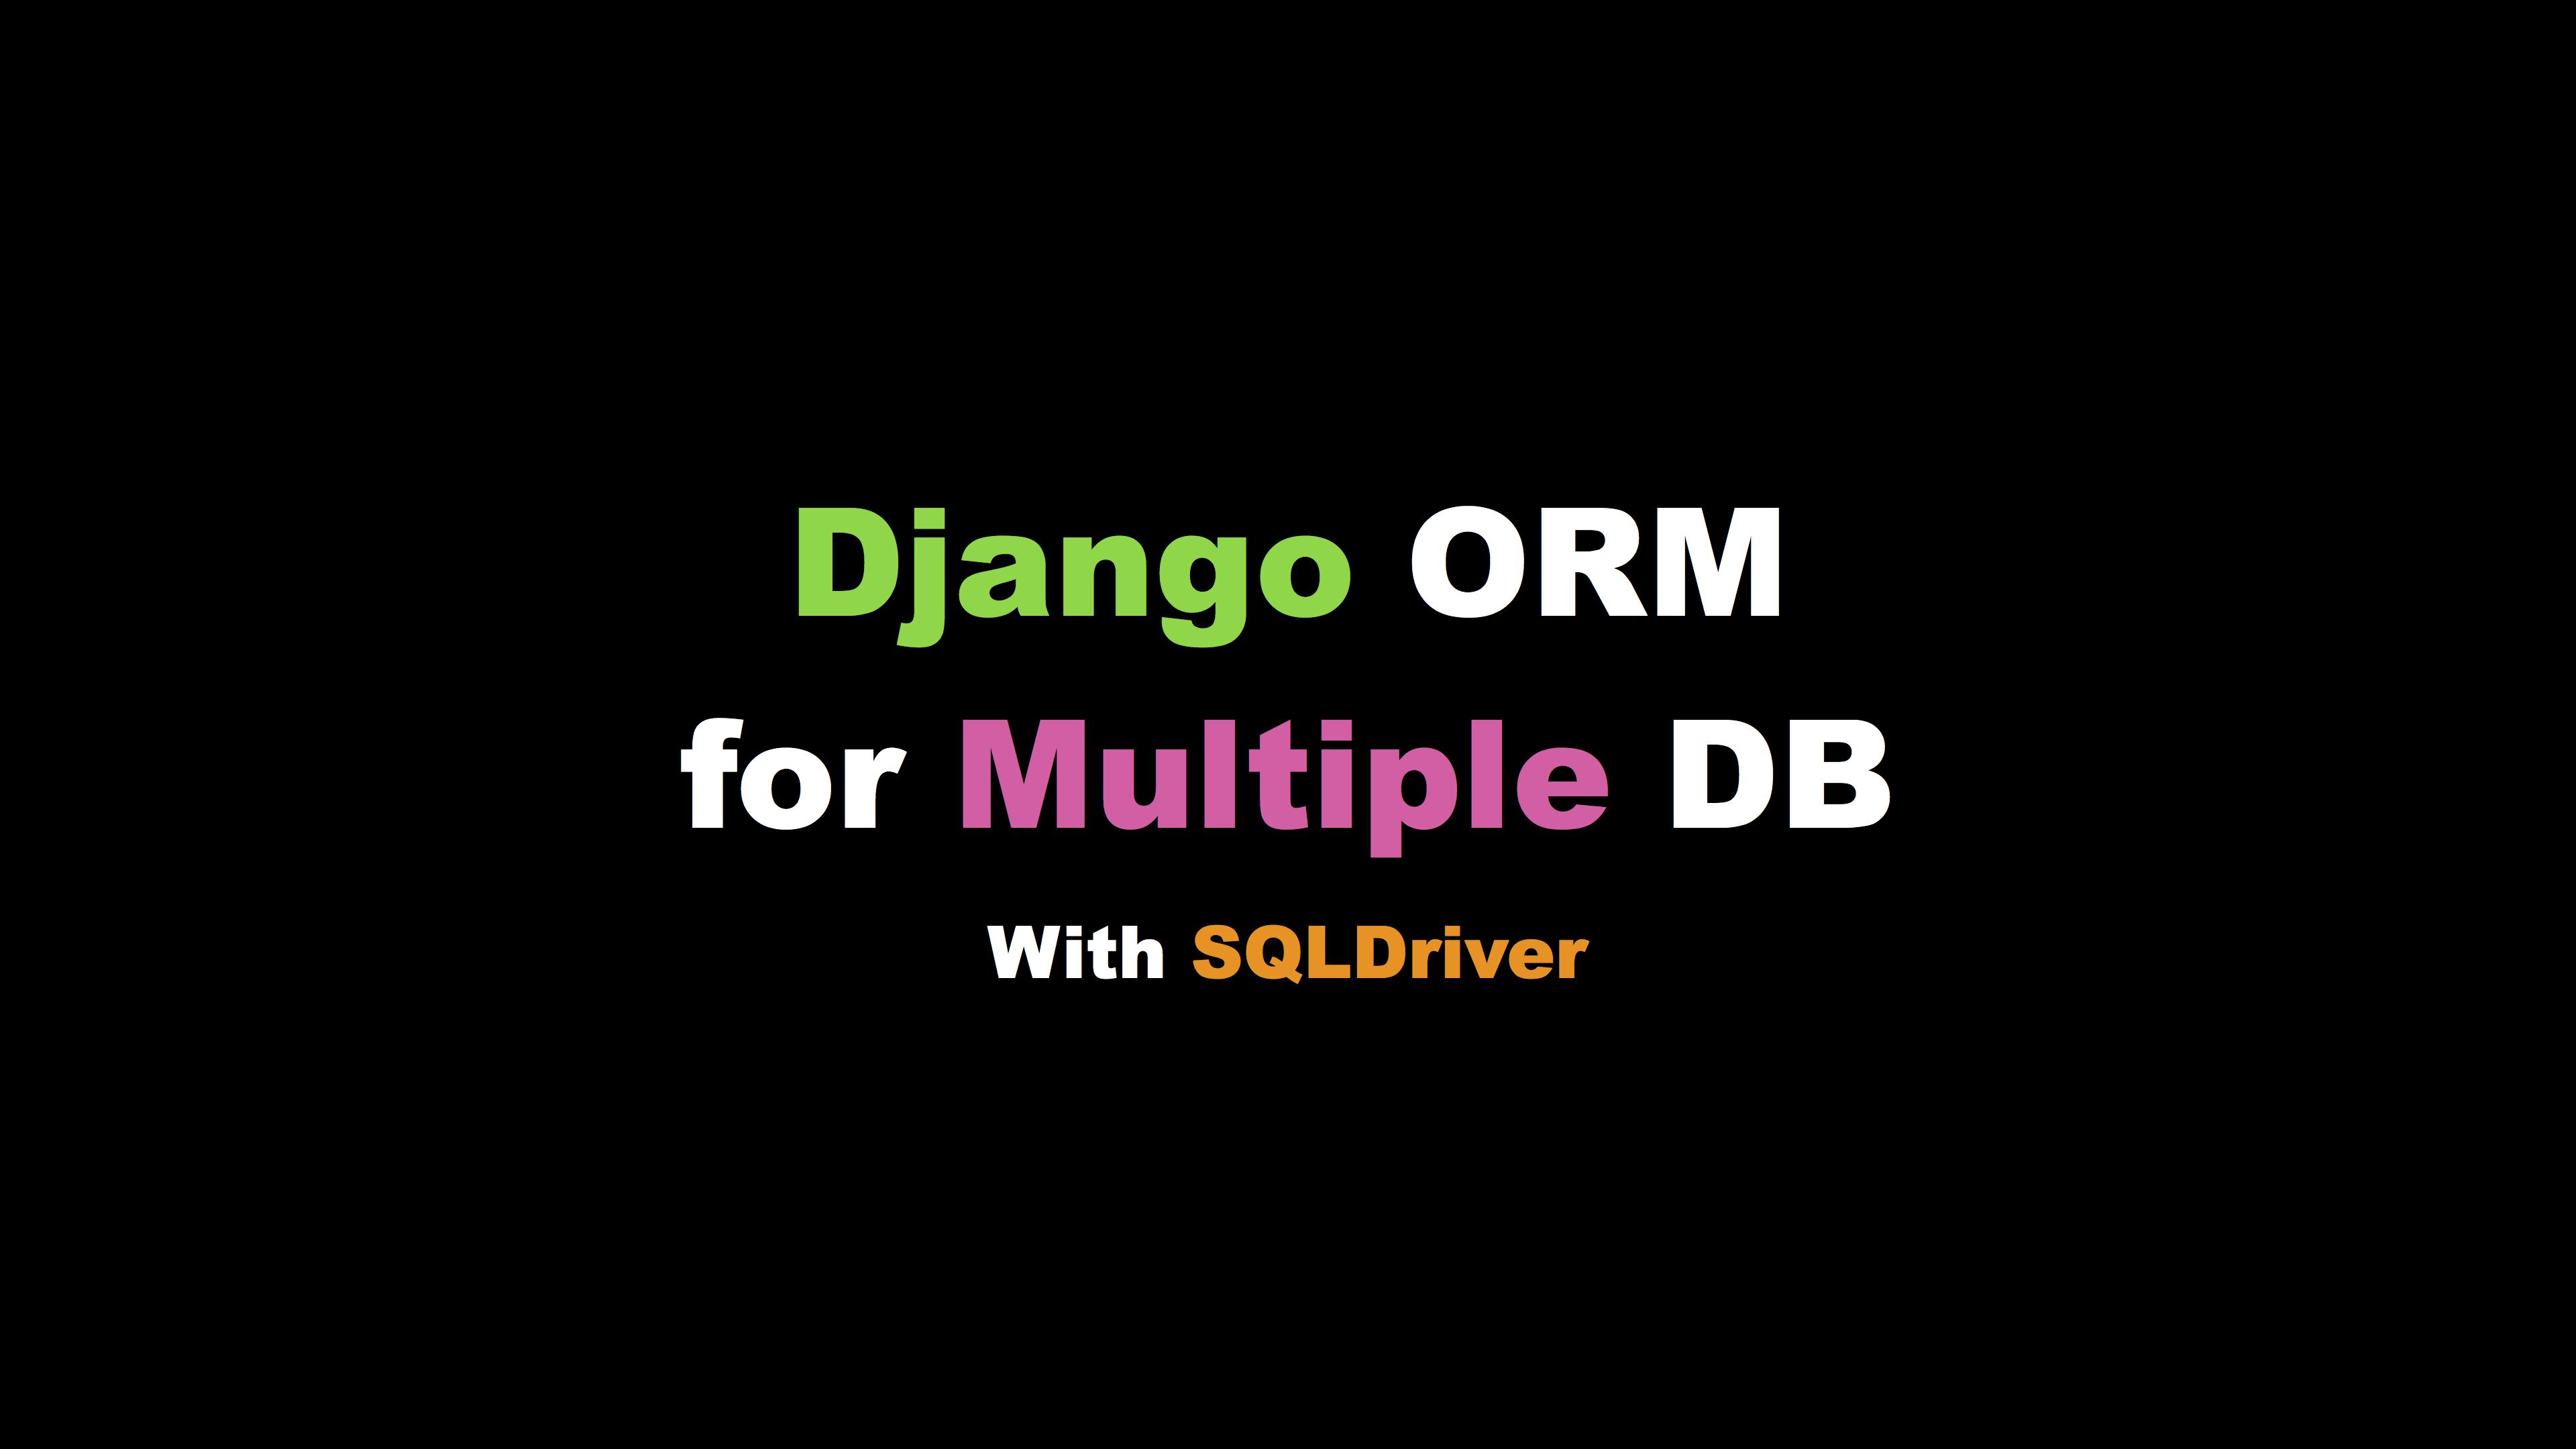 DjangoORM에서 SQL Driver 지정해 Query & Pandas DataFrame 얻어내기